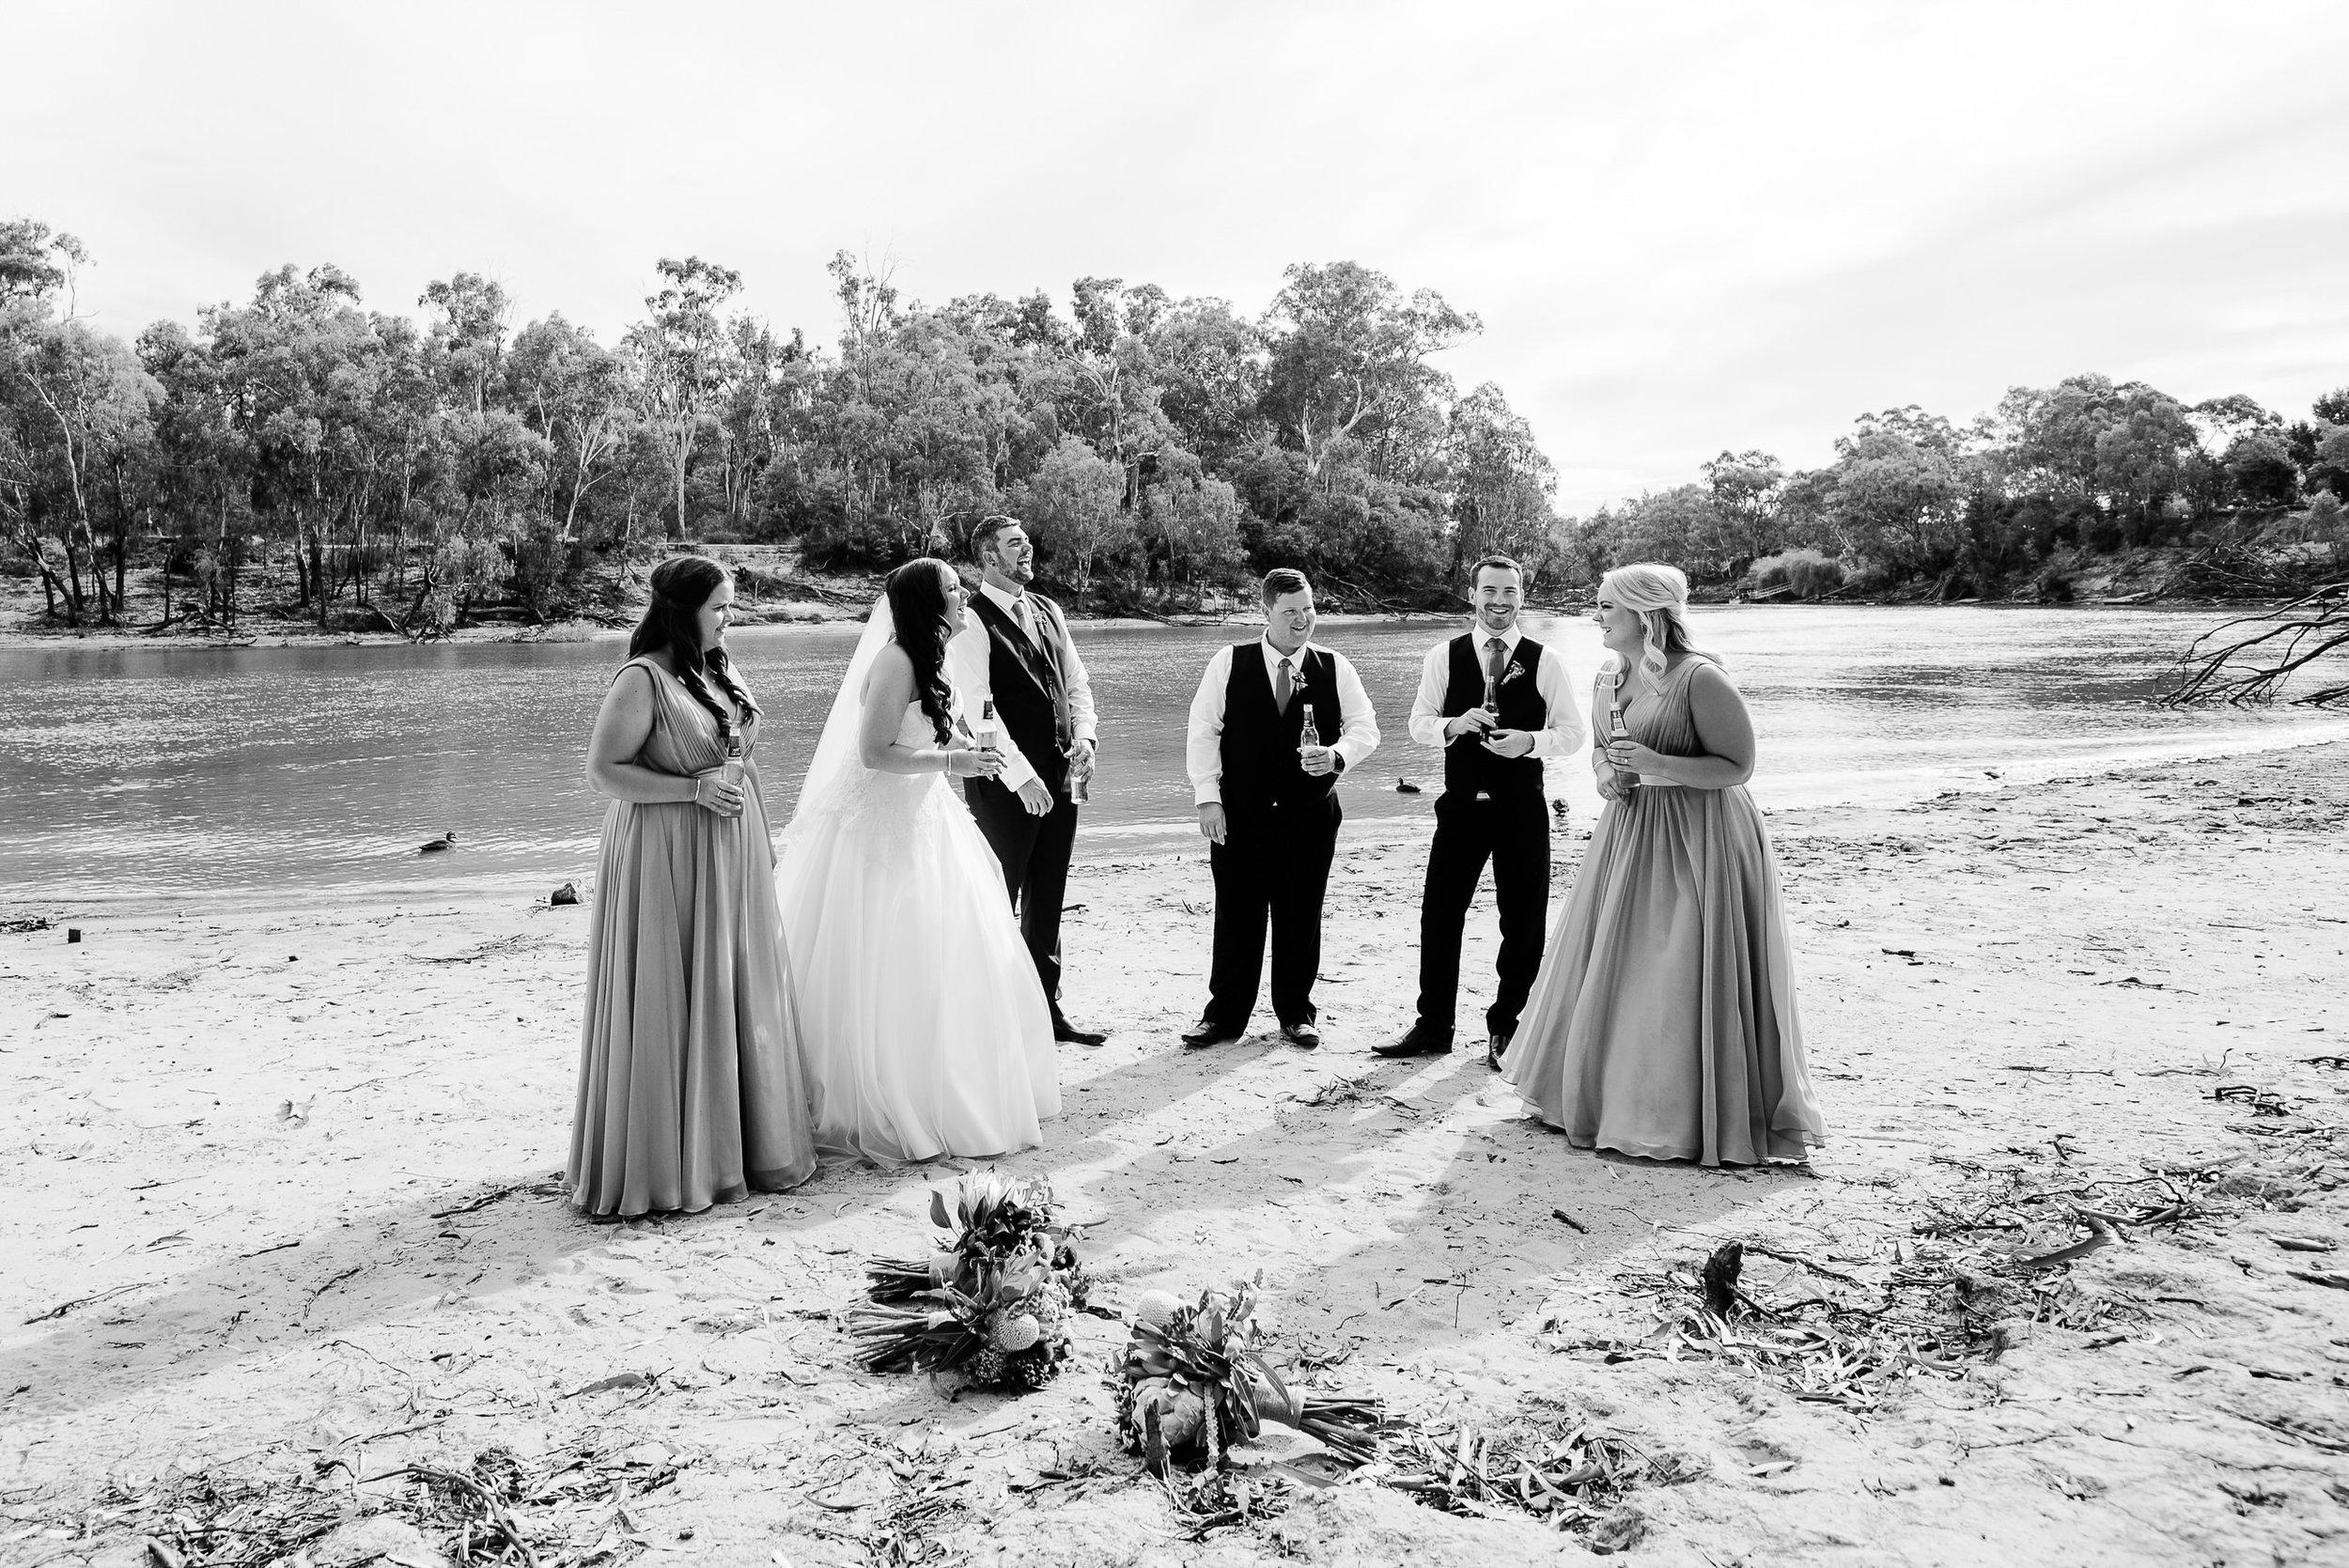 Justin_Jim_Echuca_Wedding_Photography_Tindarra-238.JPG